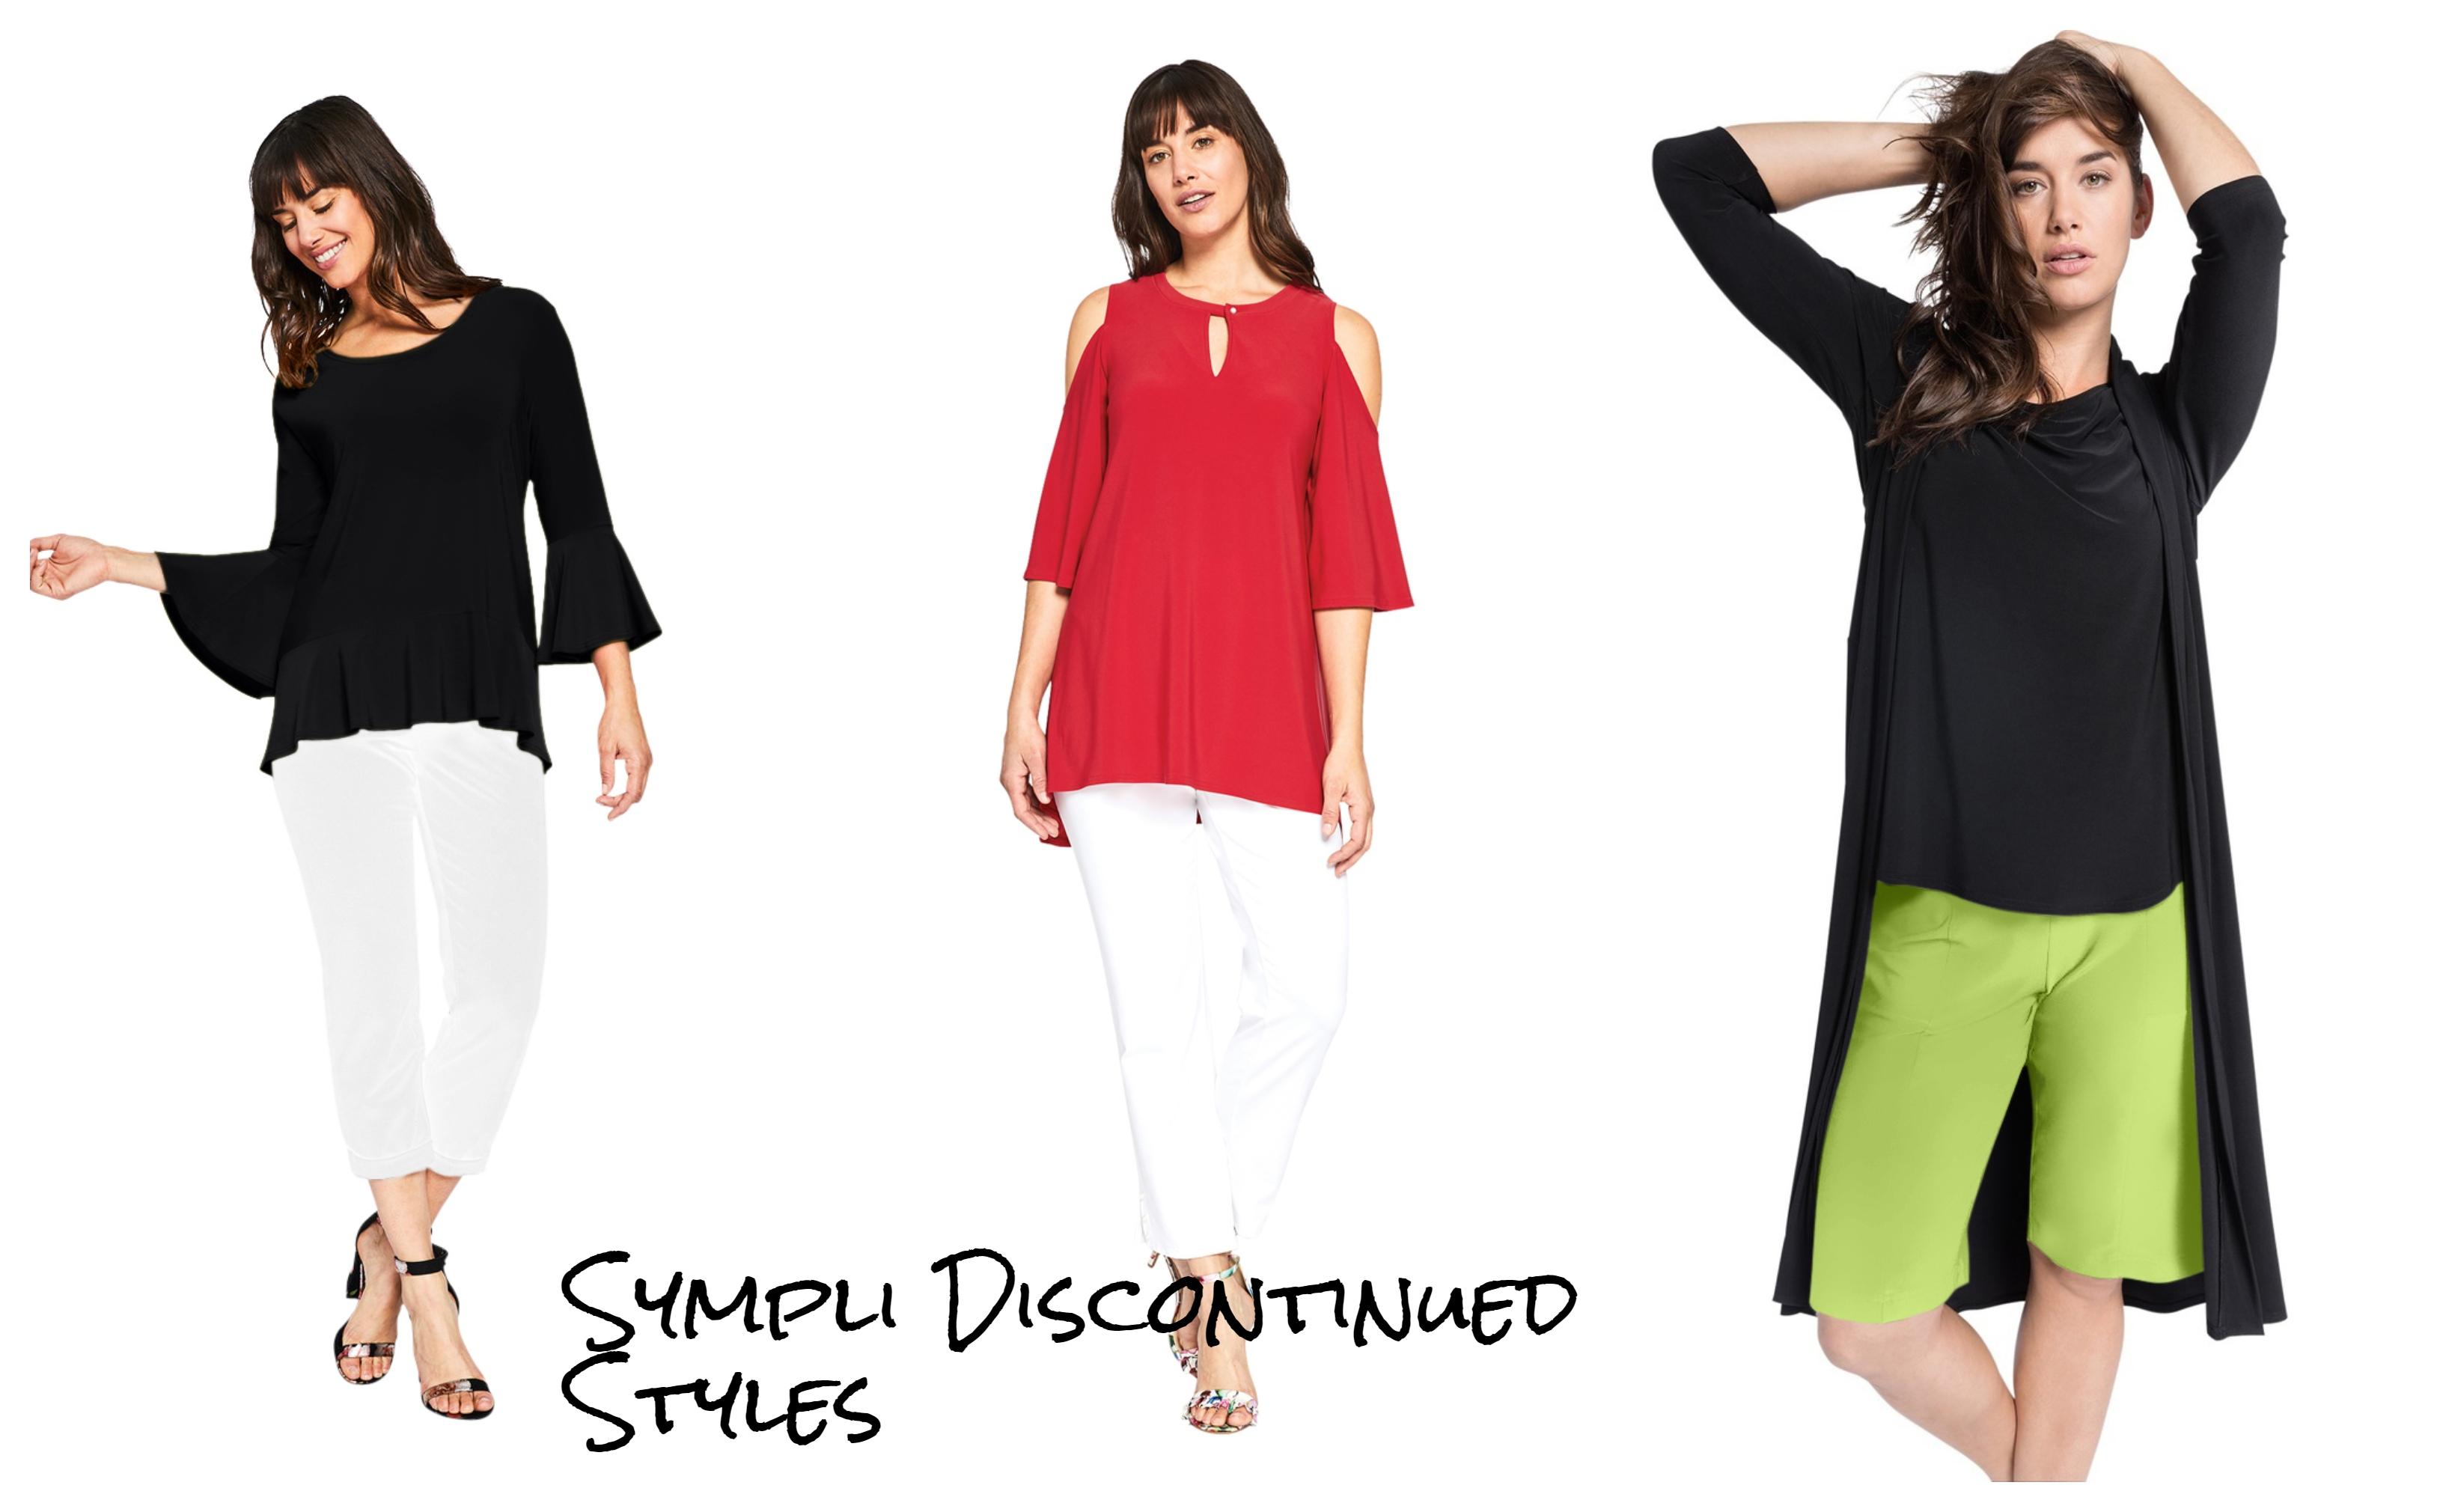 sympli-discontinued-styles.jpg